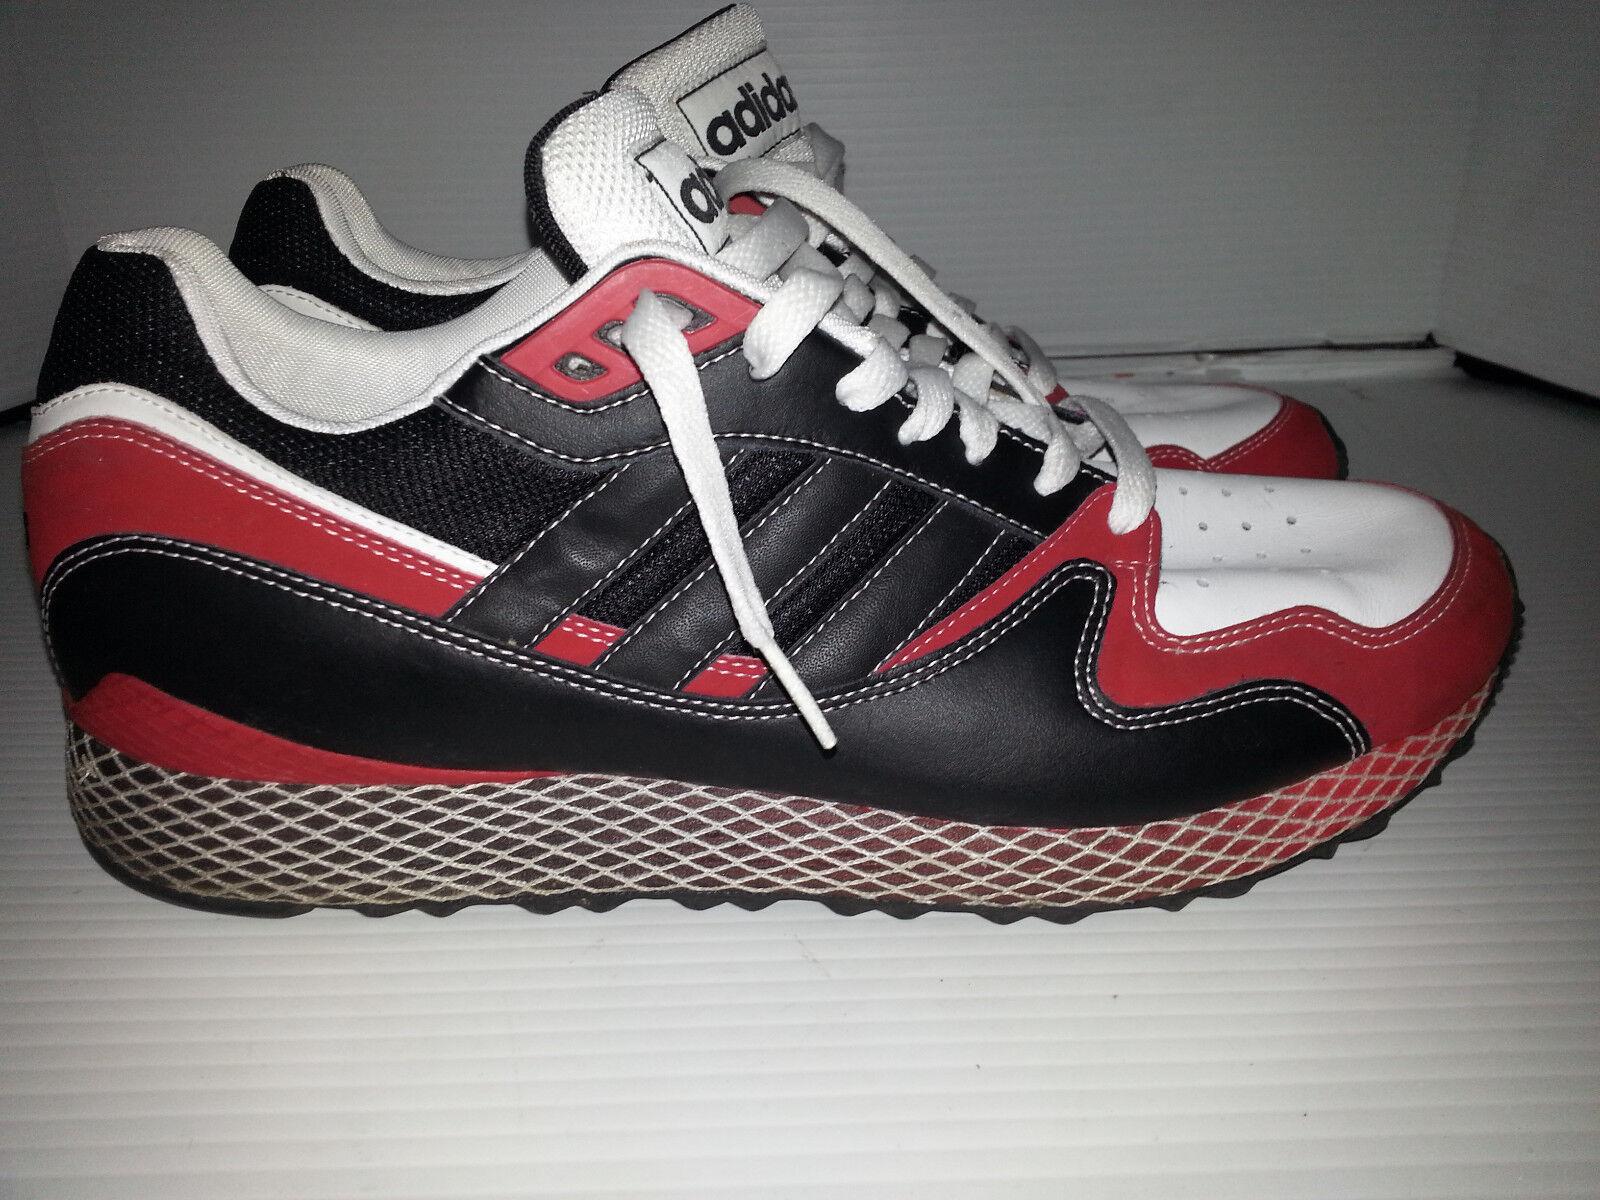 Adidas - Turnschuhe, schuhe bei tennis - - größe 11,5 rot - tennis schwarz - weiße leder - basketball 32bdd6